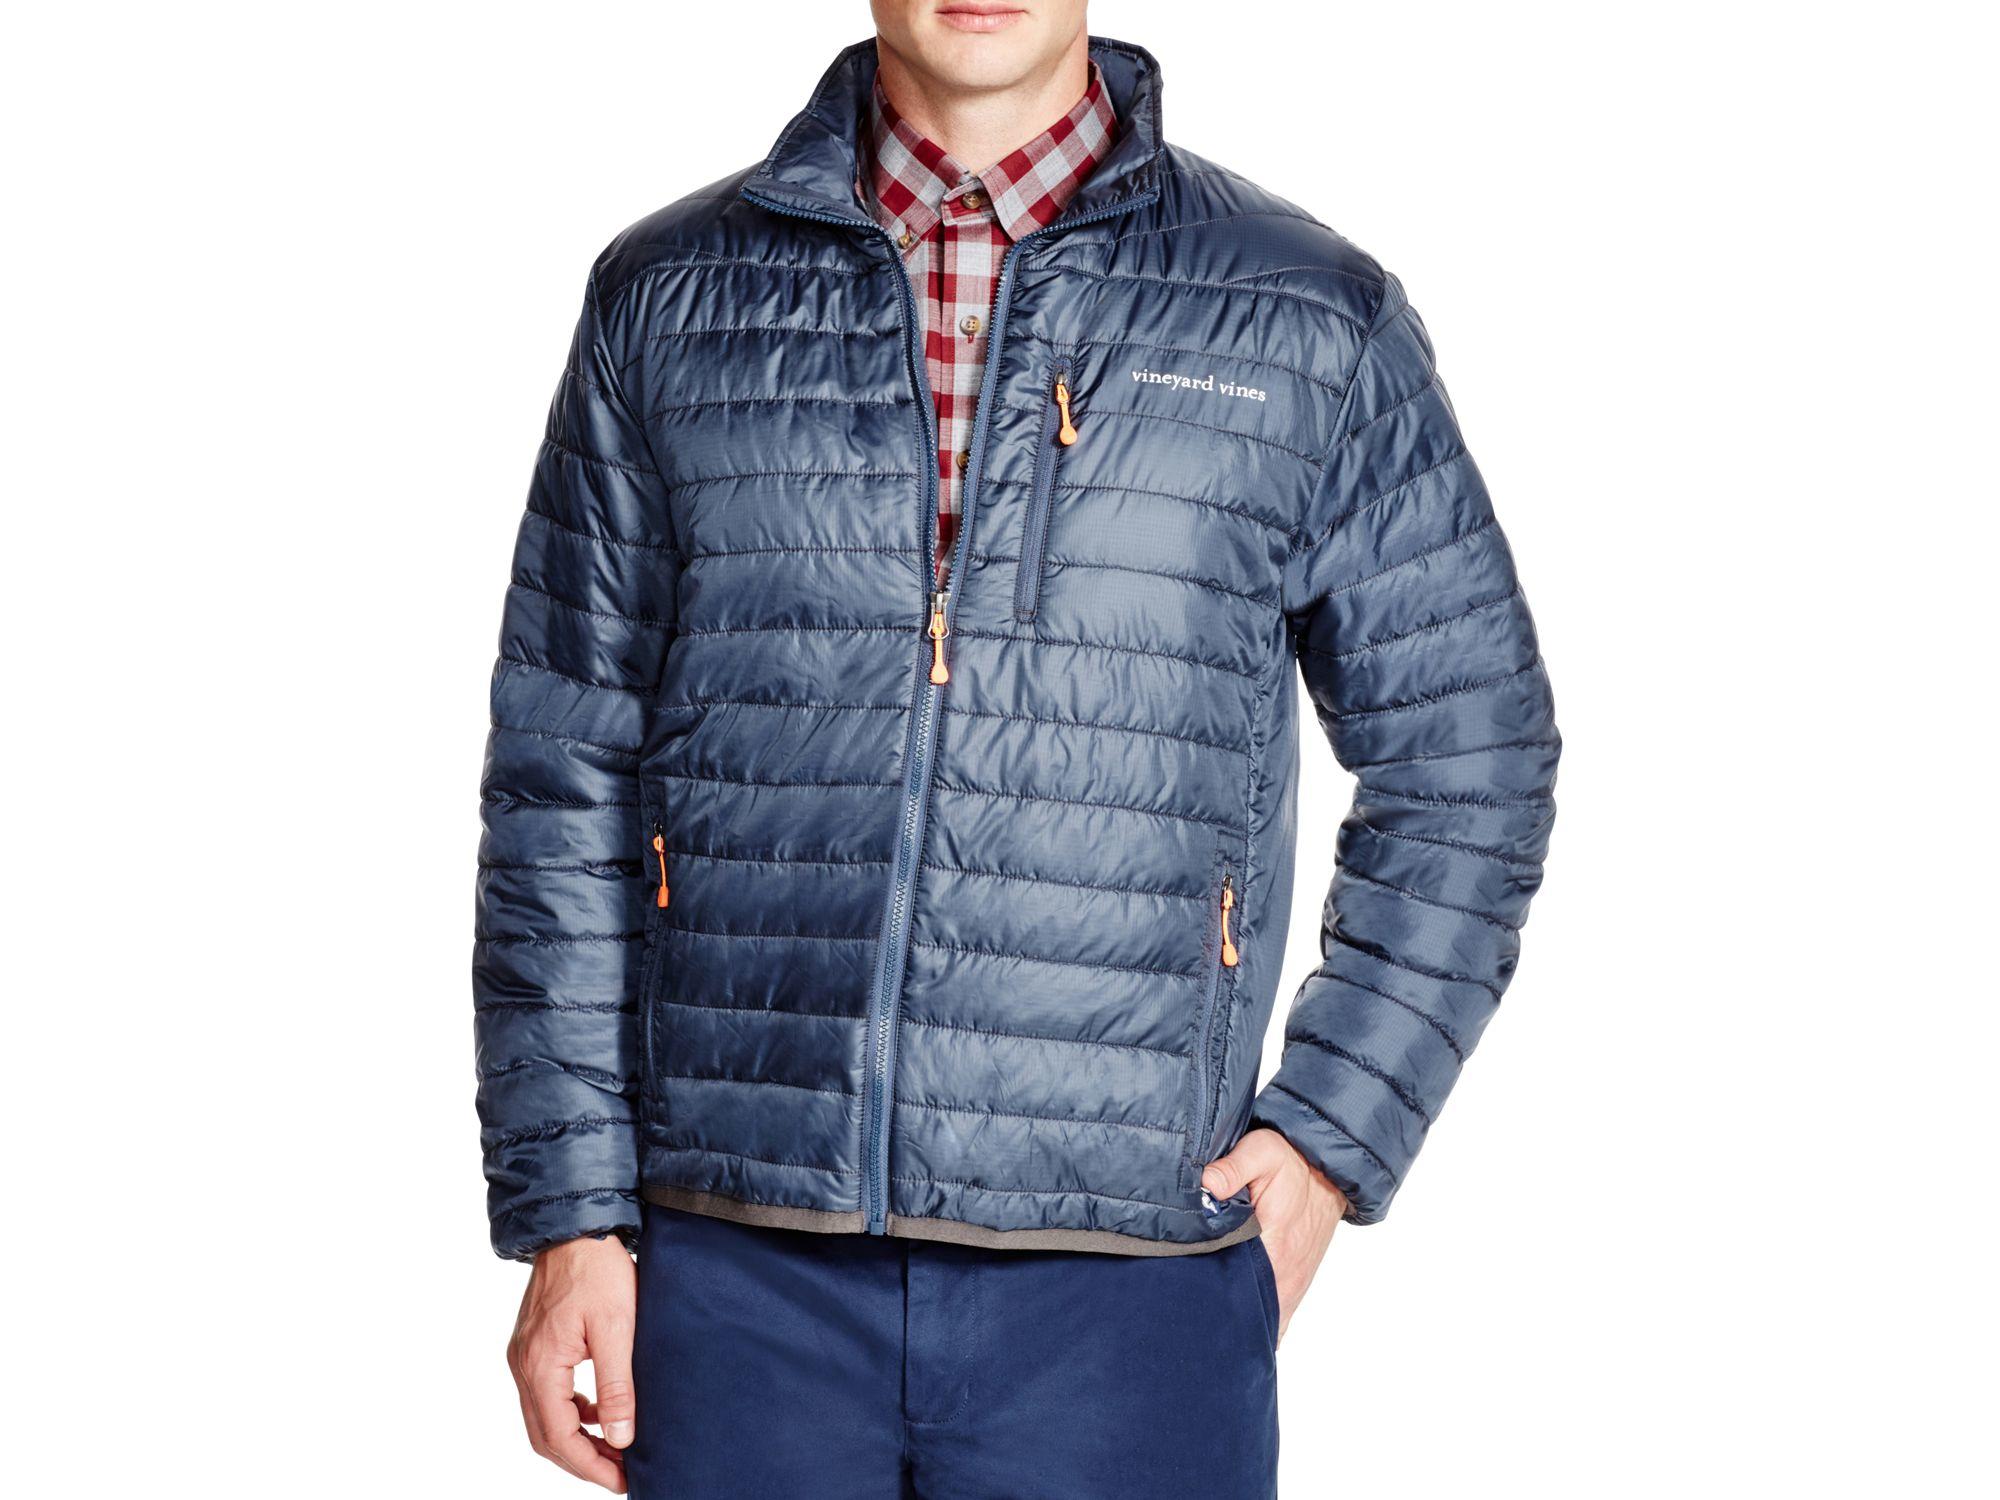 Lyst Vineyard Vines Mountain Weekend Jacket In Blue For Men